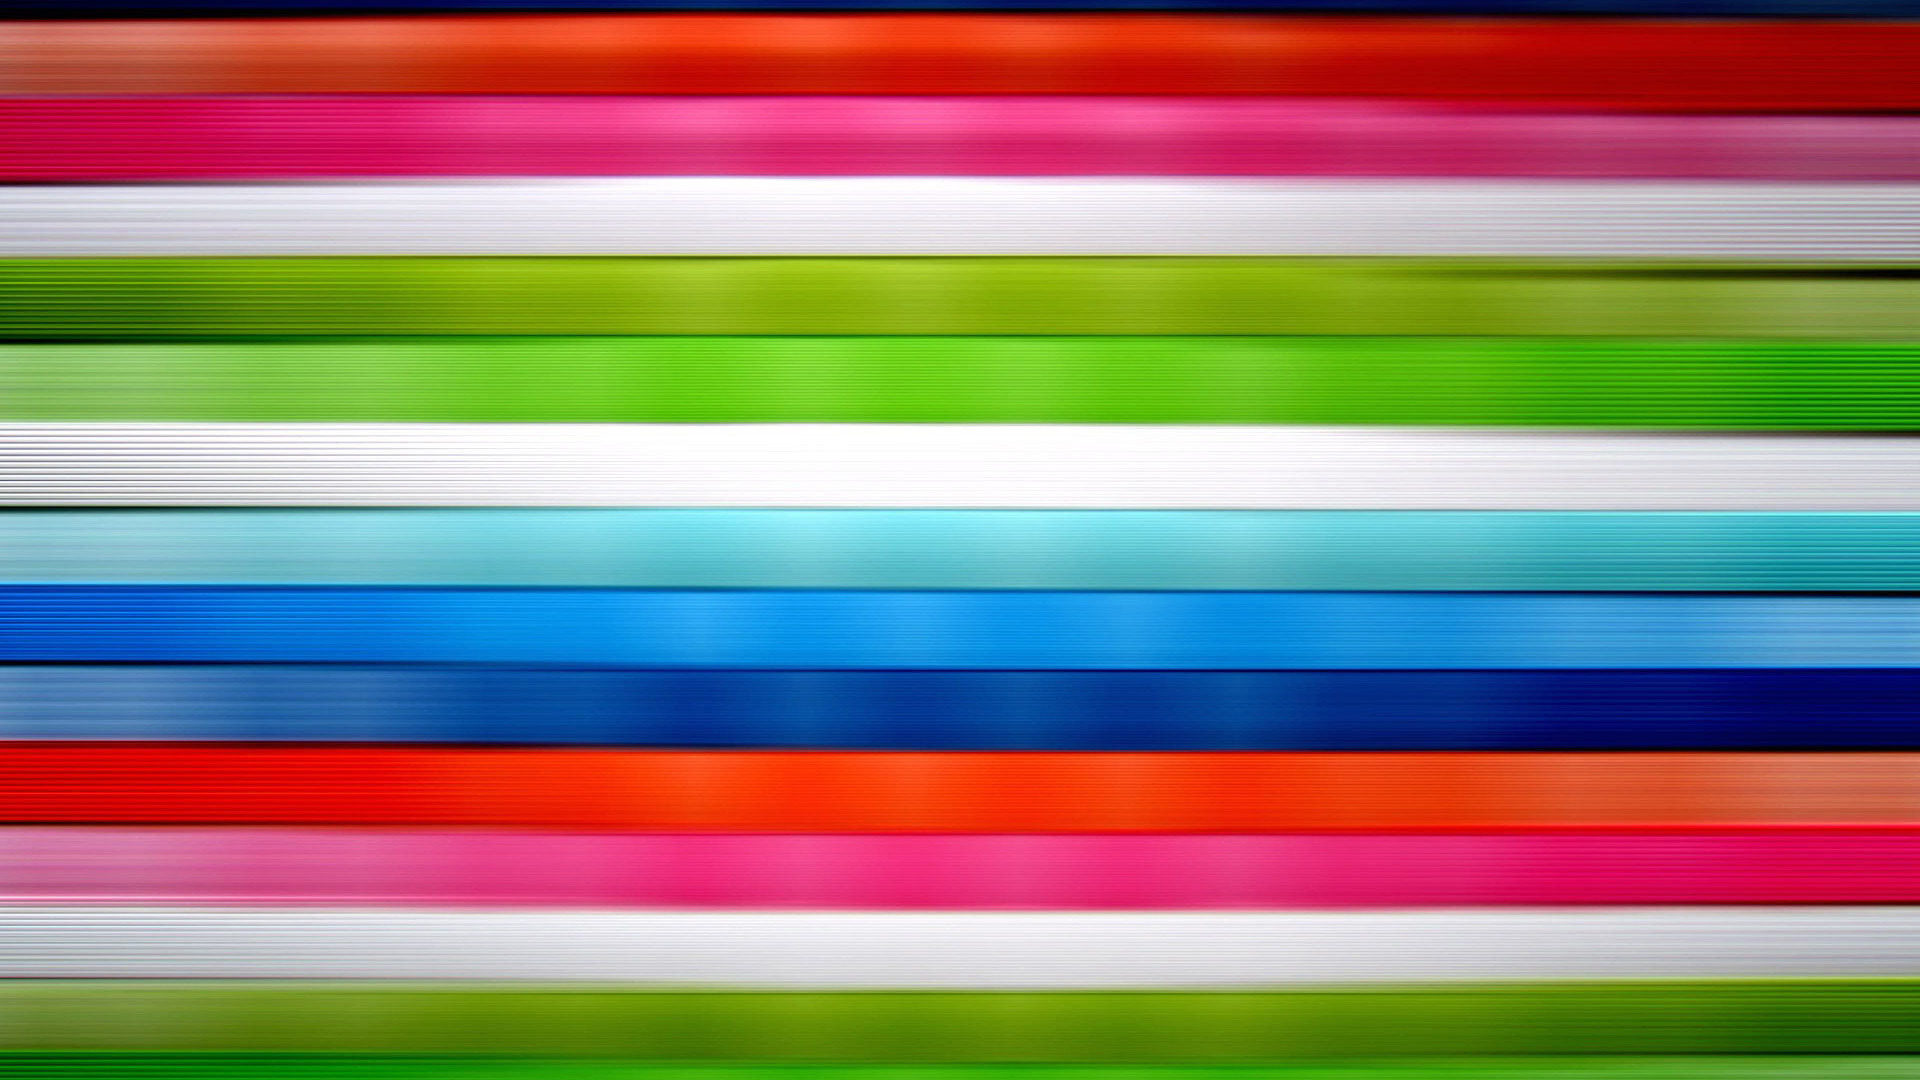 Download Horizontal vivid colored stripes wallpaper 1920x1080